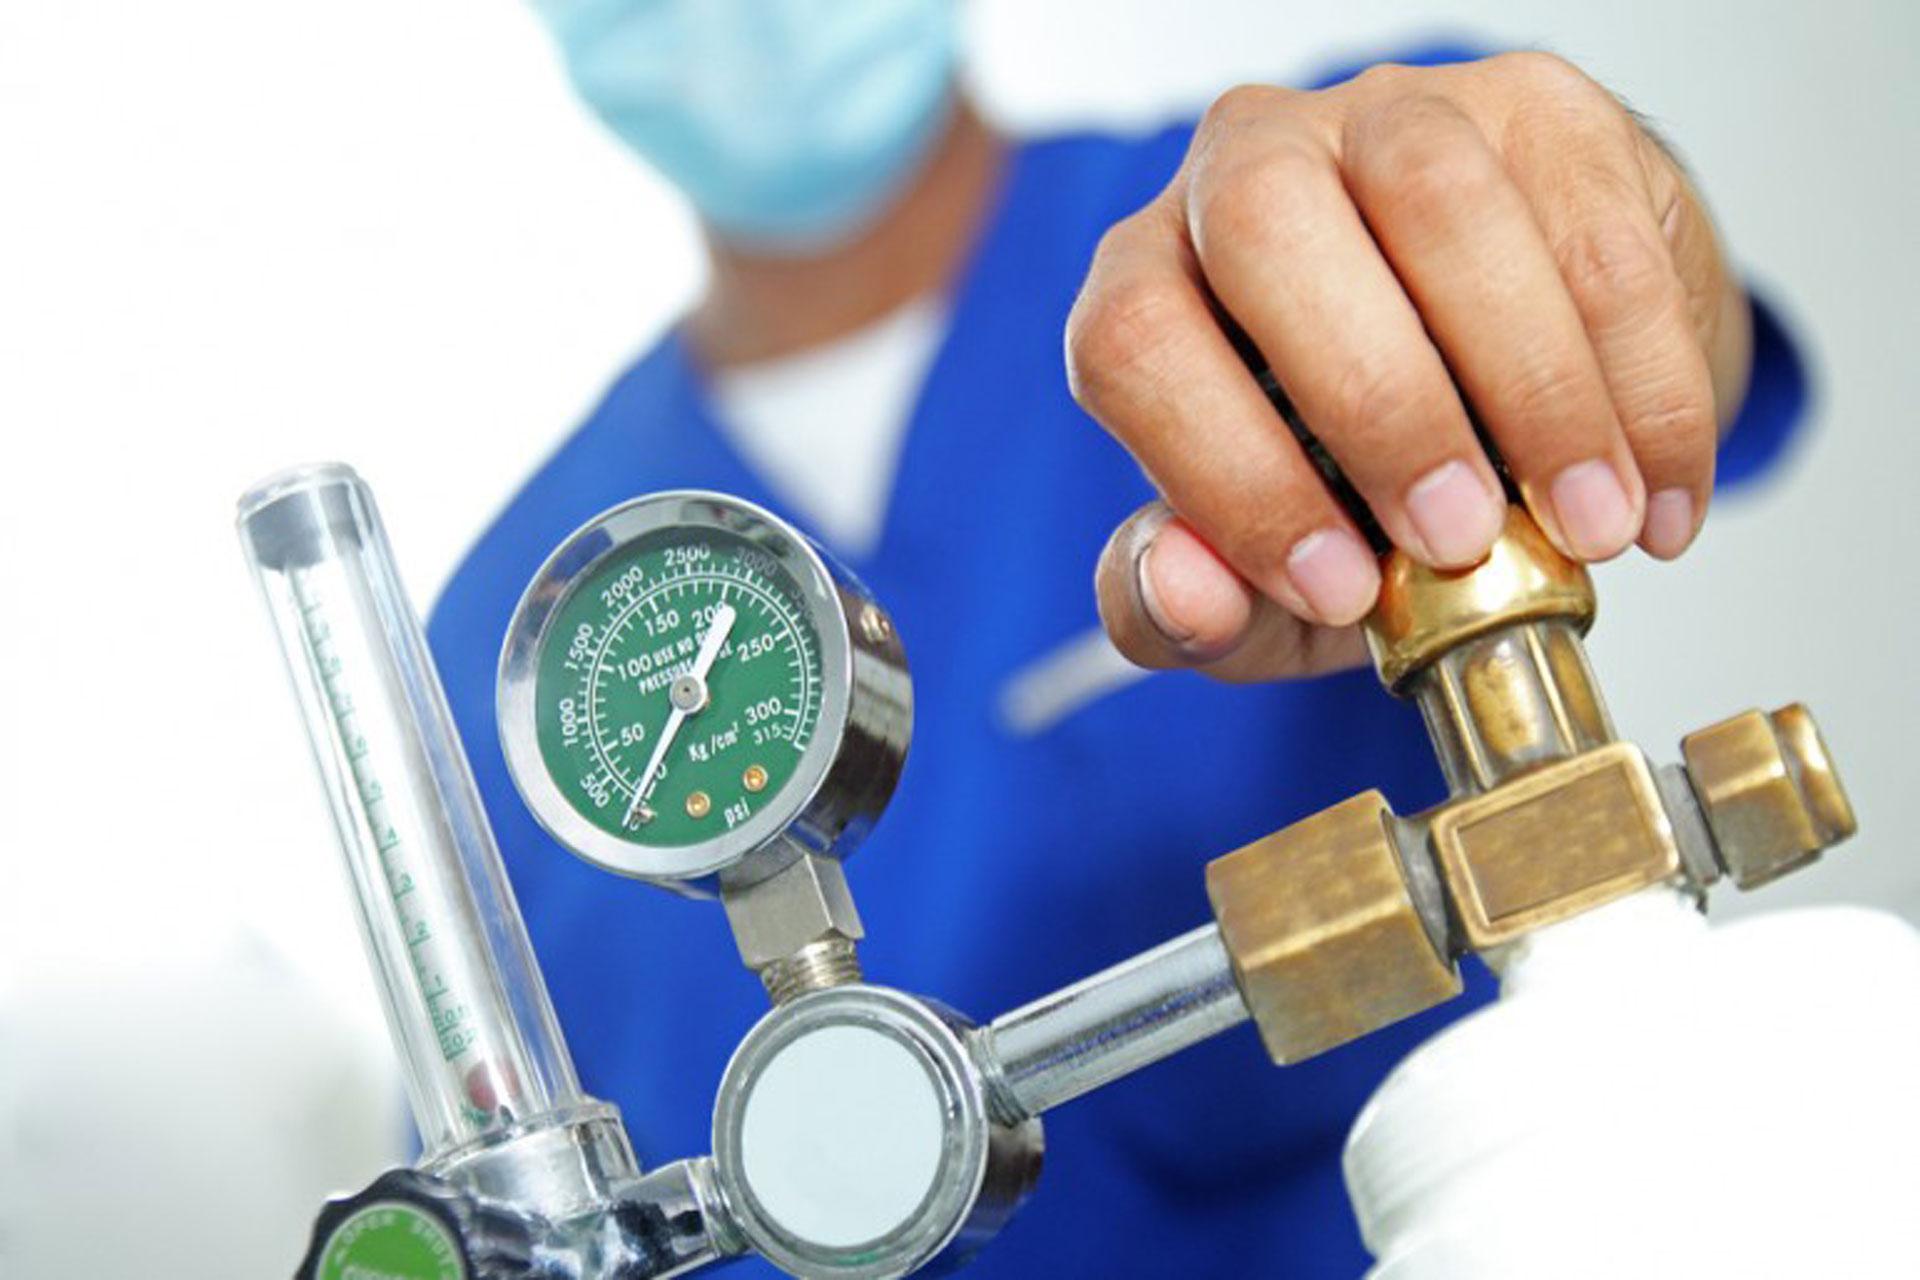 sisteme-complete-de-oxigenoterapie-in-oferta